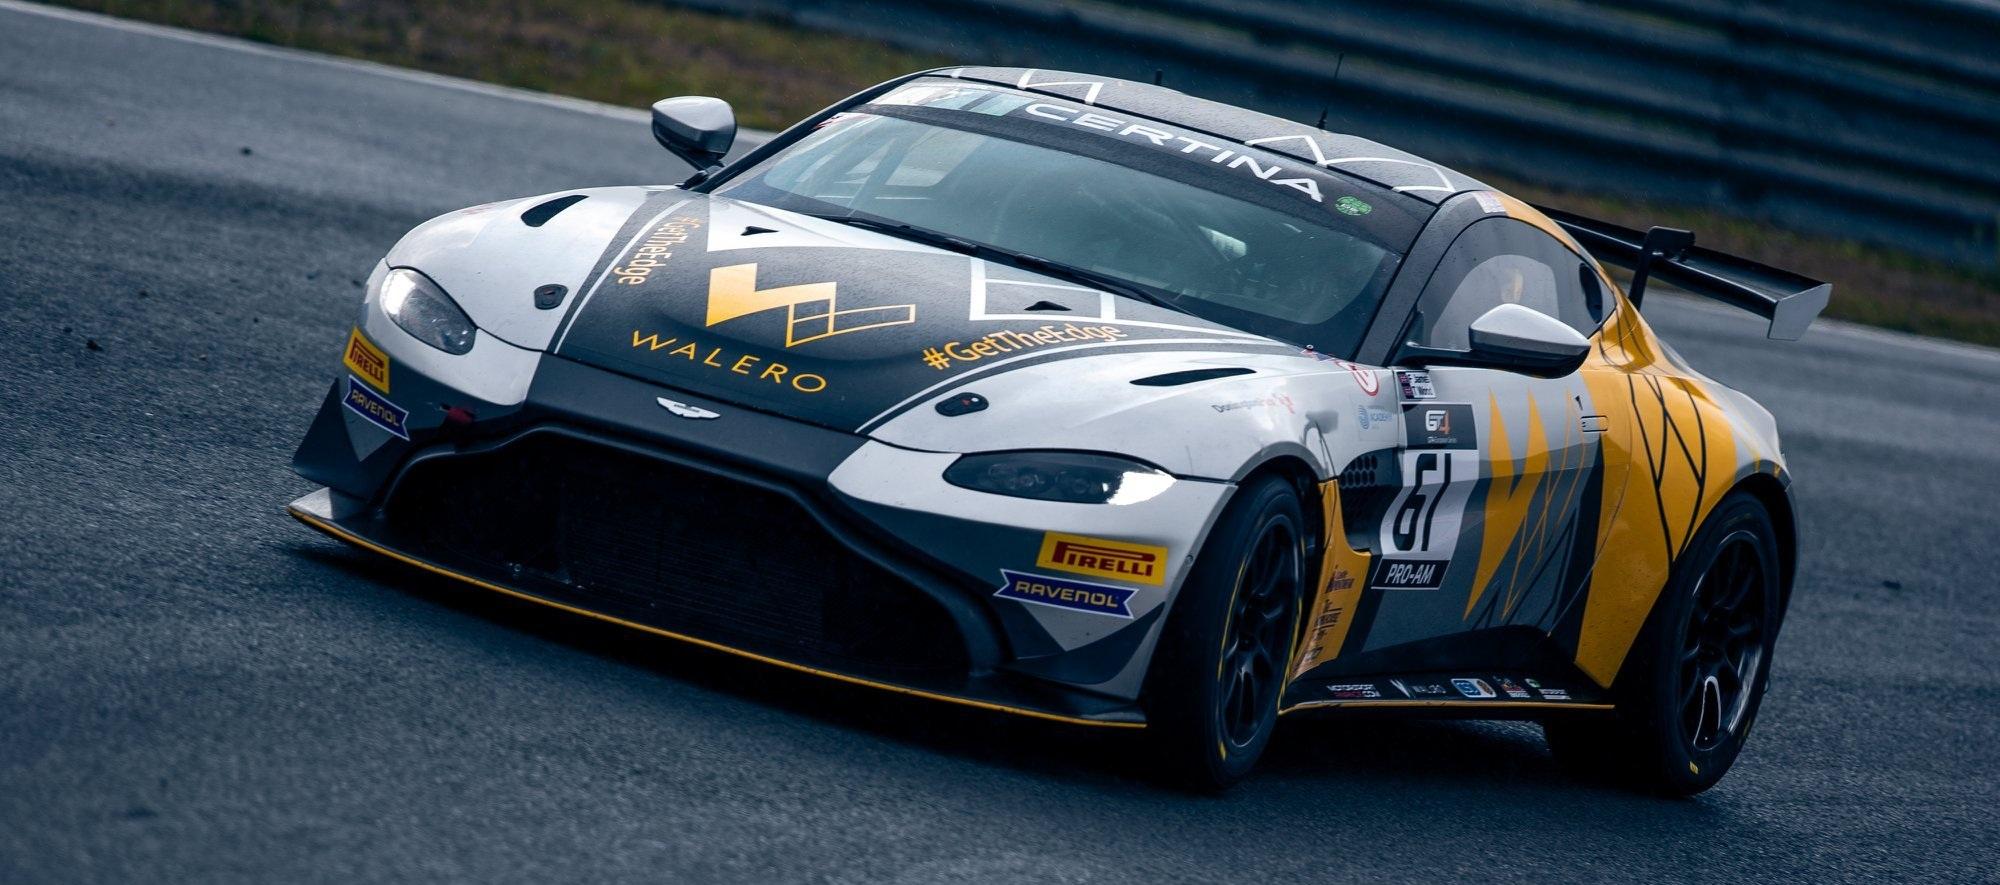 Walero+sponsored+Academy+Motorsports+GT4.jpg